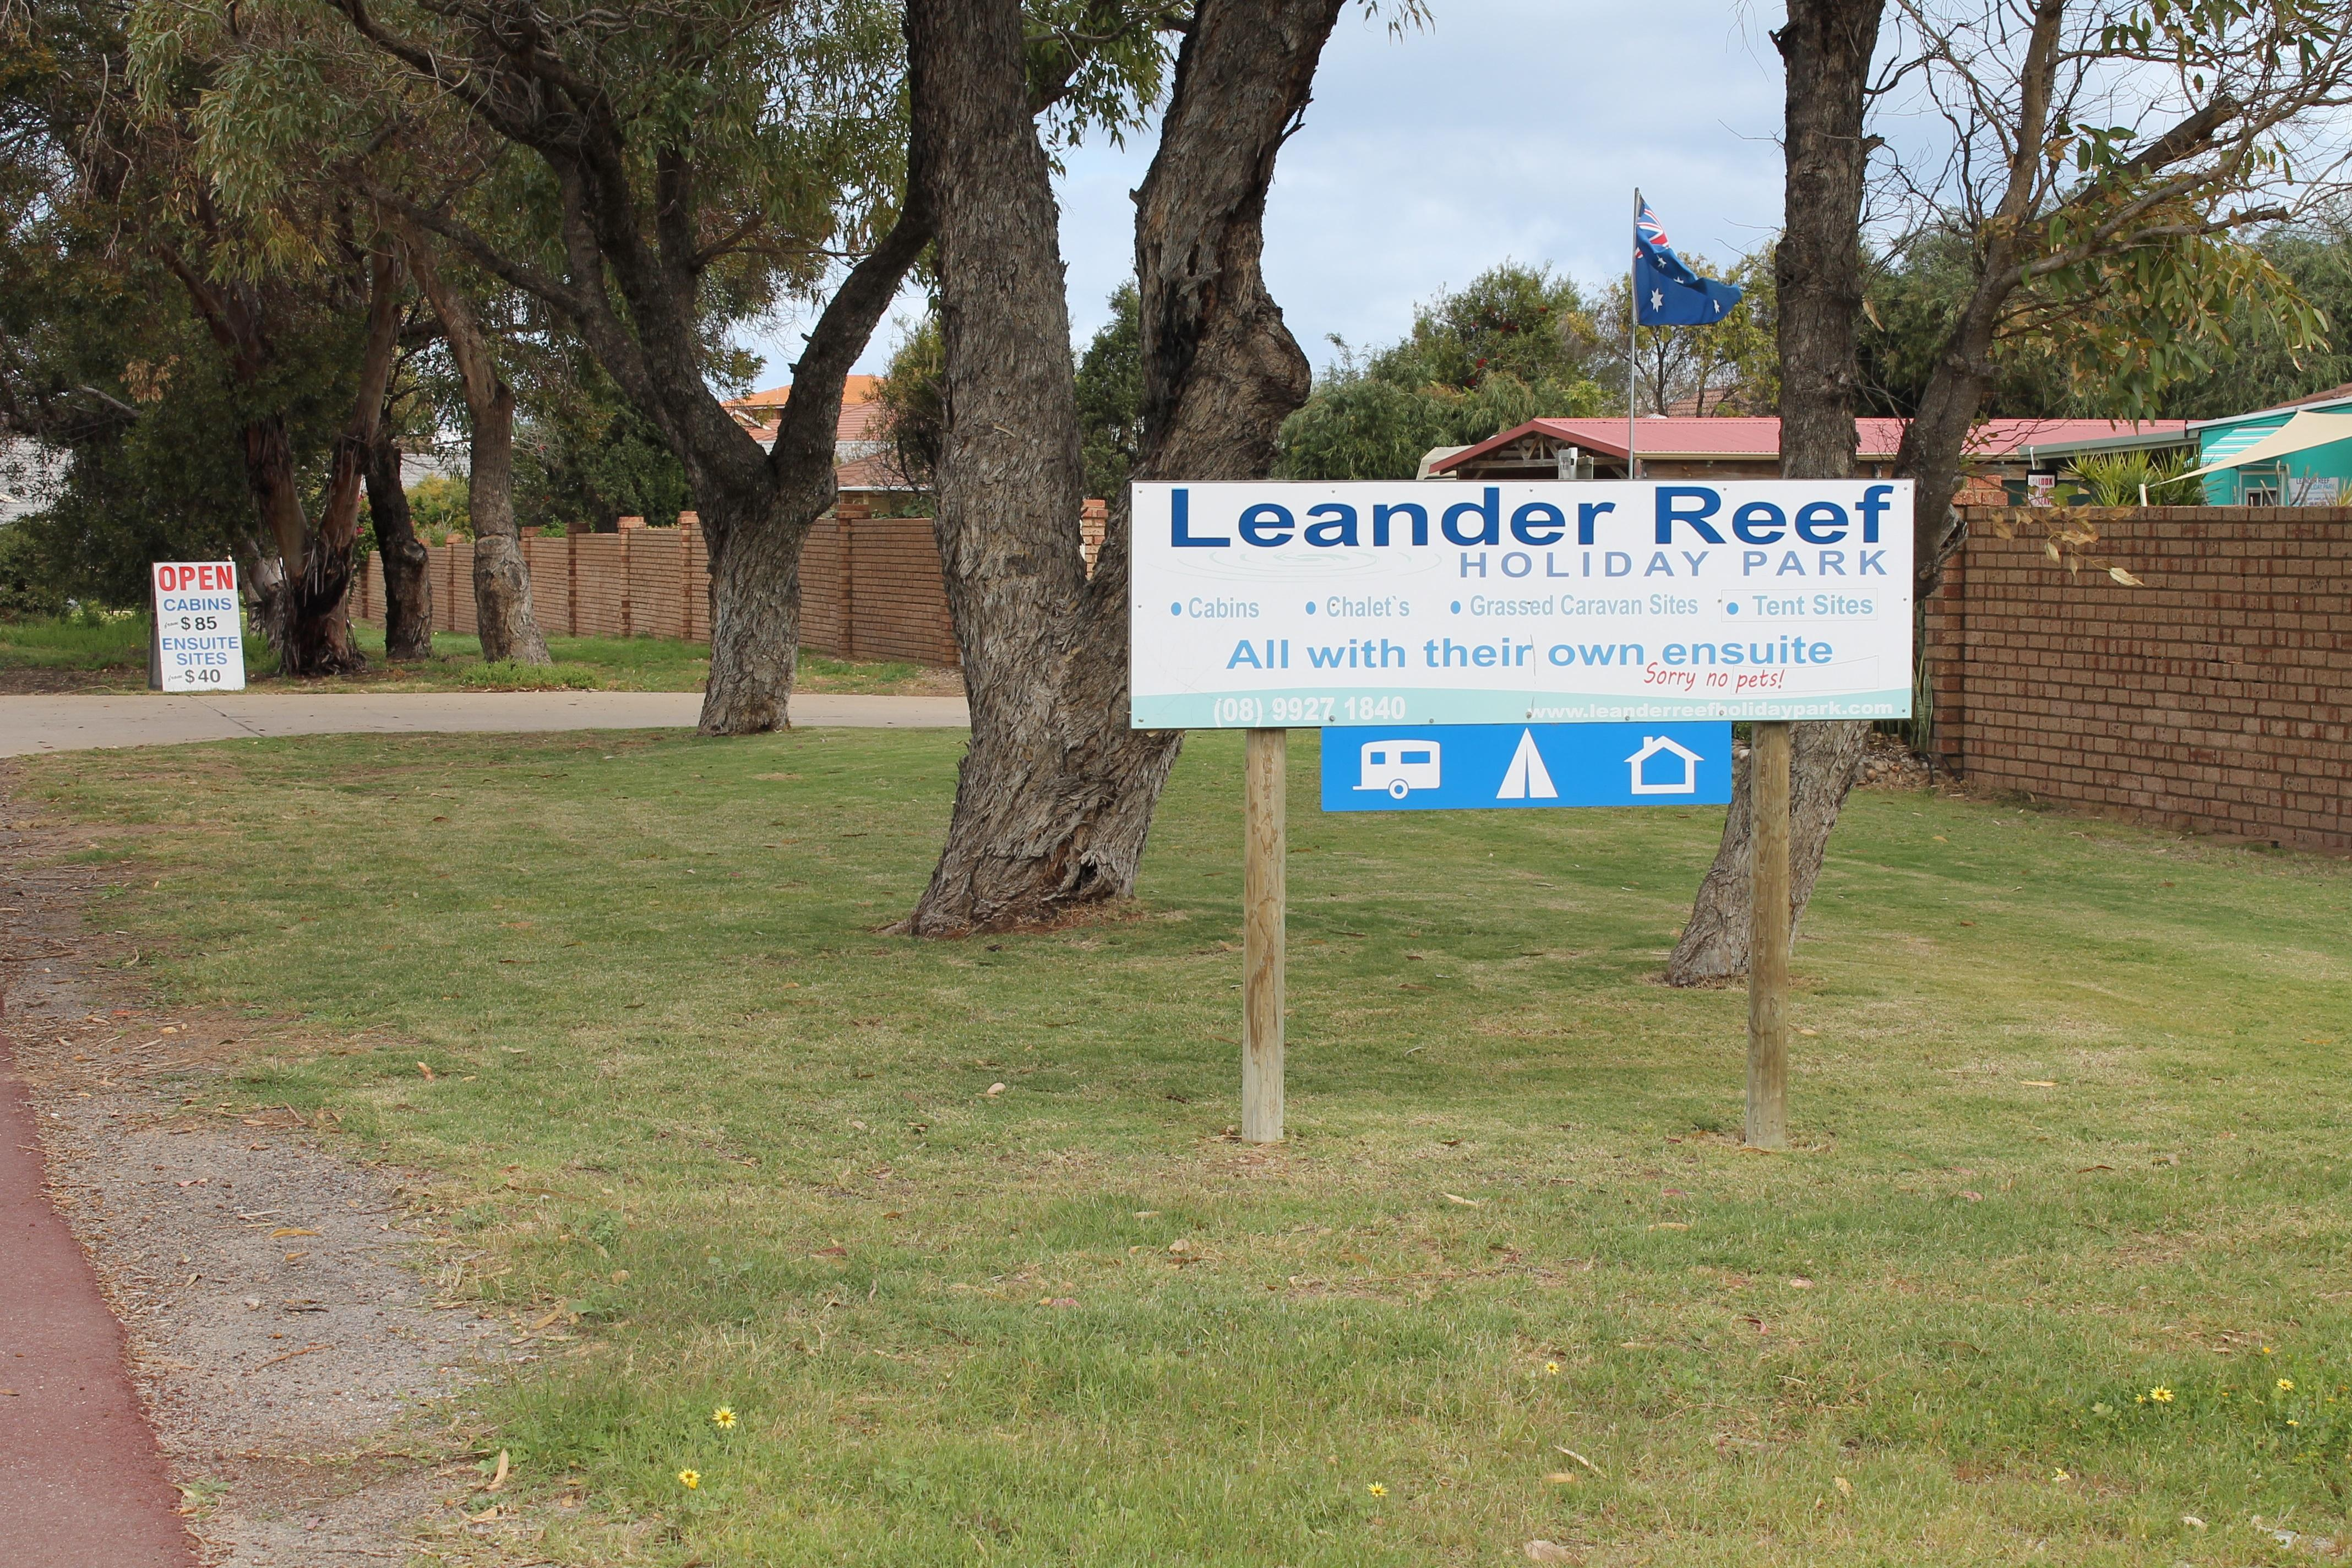 Leander Reef Holiday Park